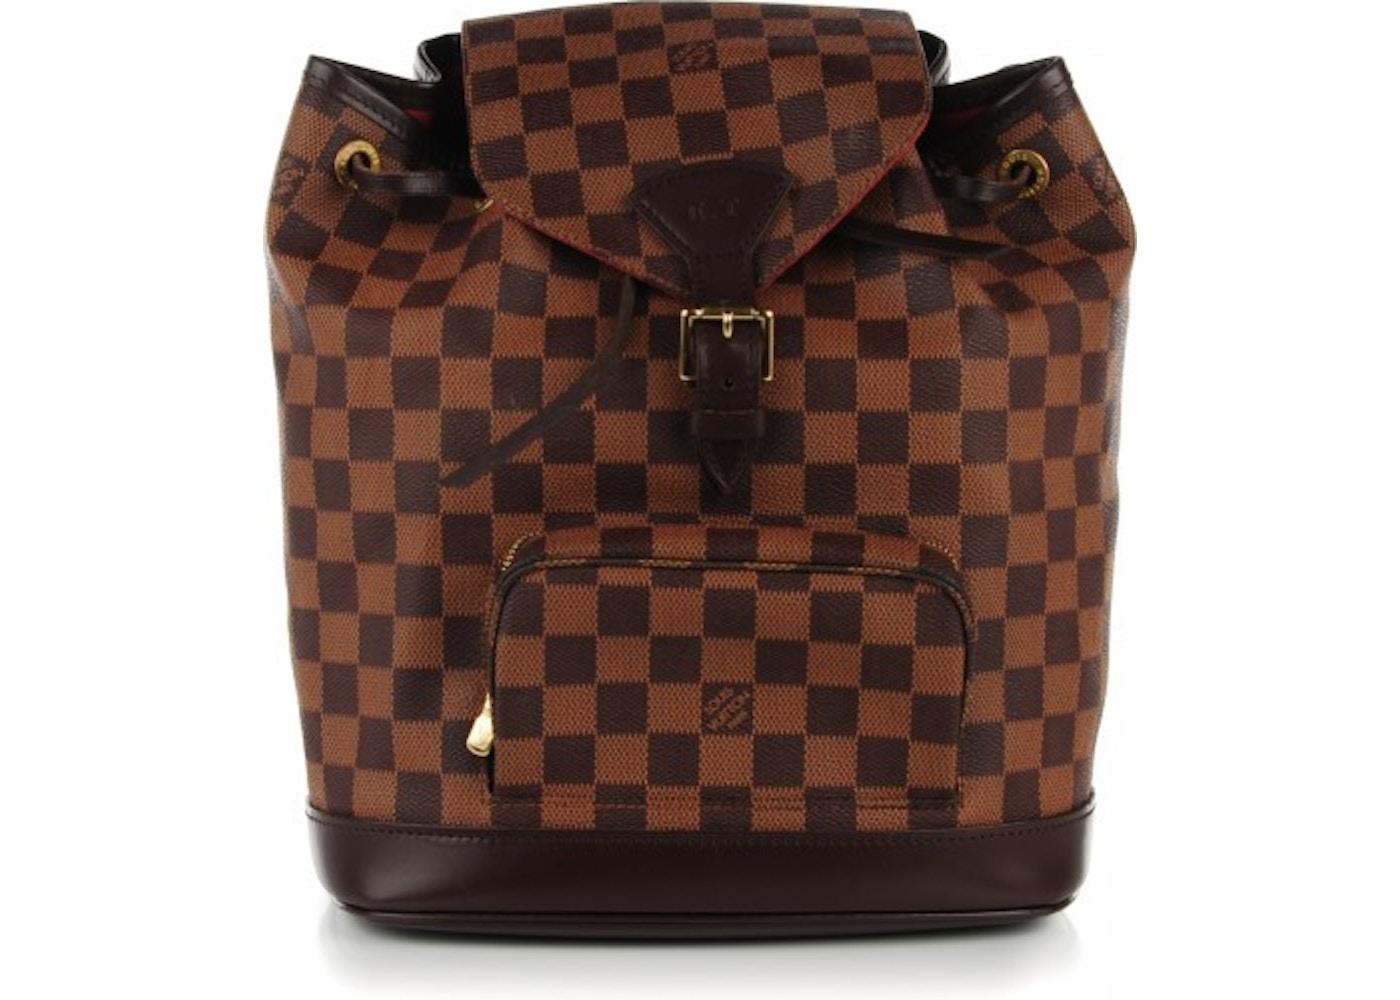 8d4a38c00357 Louis Vuitton Backpack Montsouris Damier Ebene MM. Damier Ebene MM